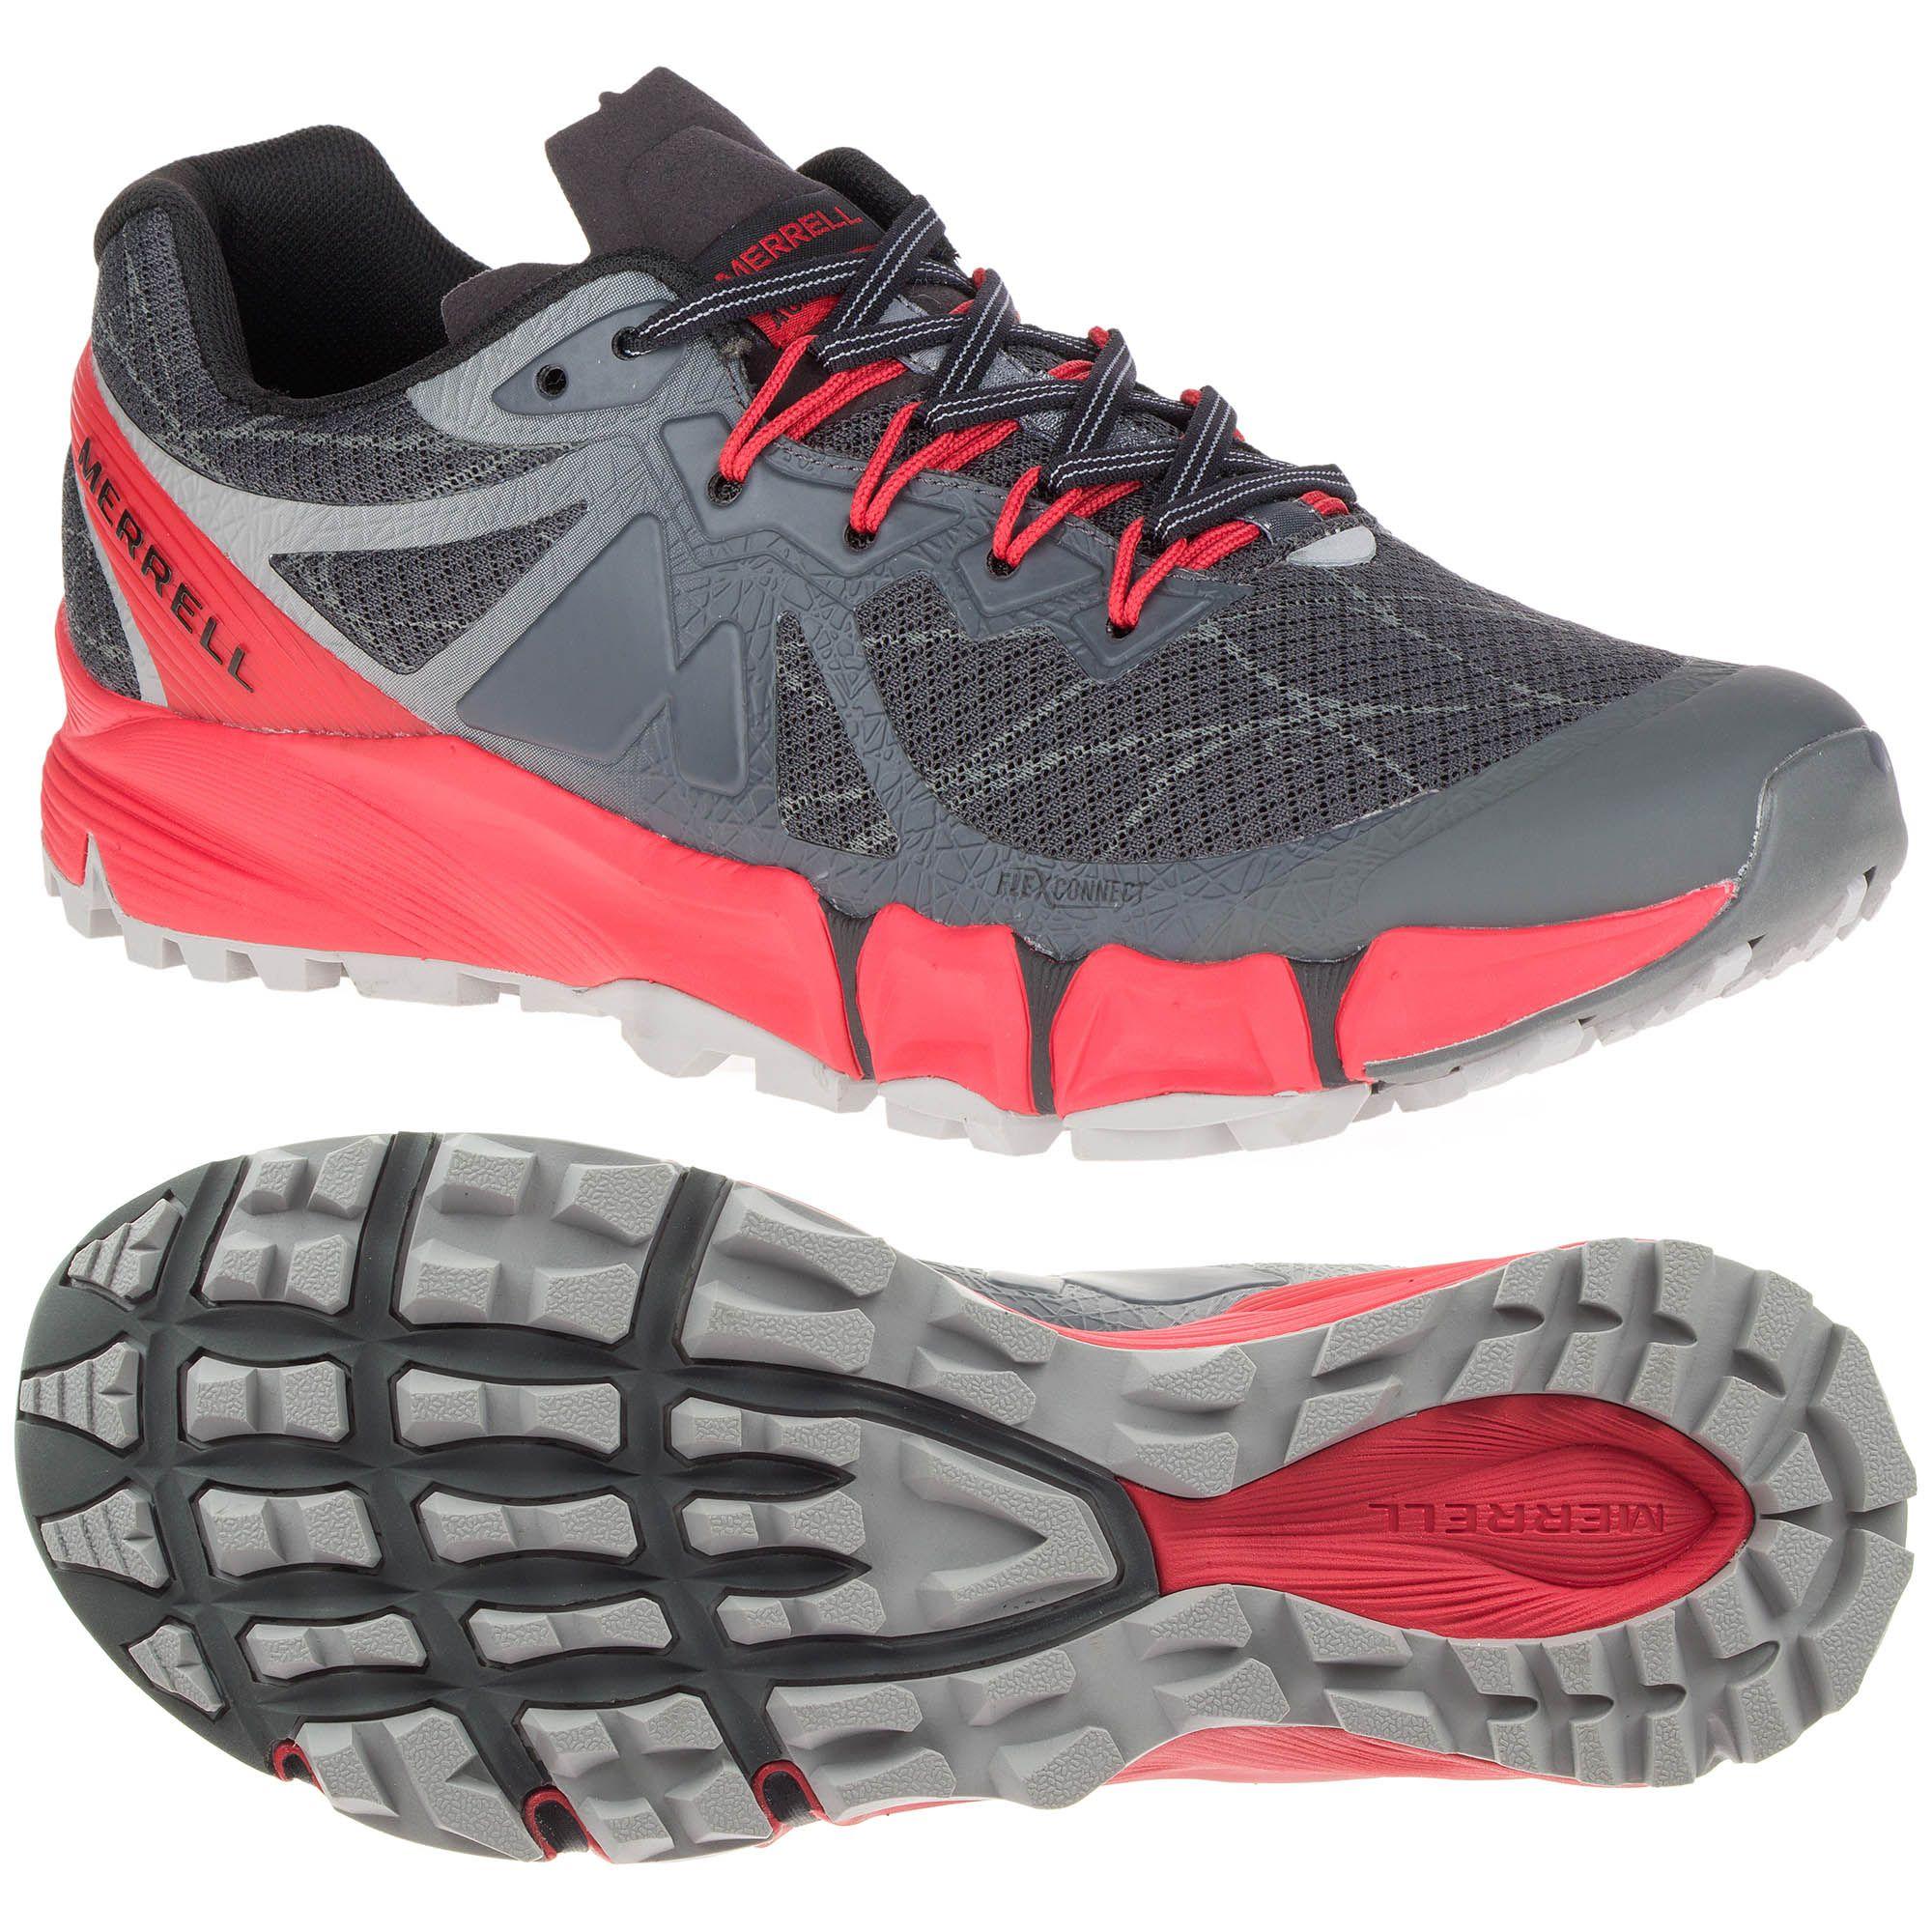 Running Shoes Polyurethane Midsole